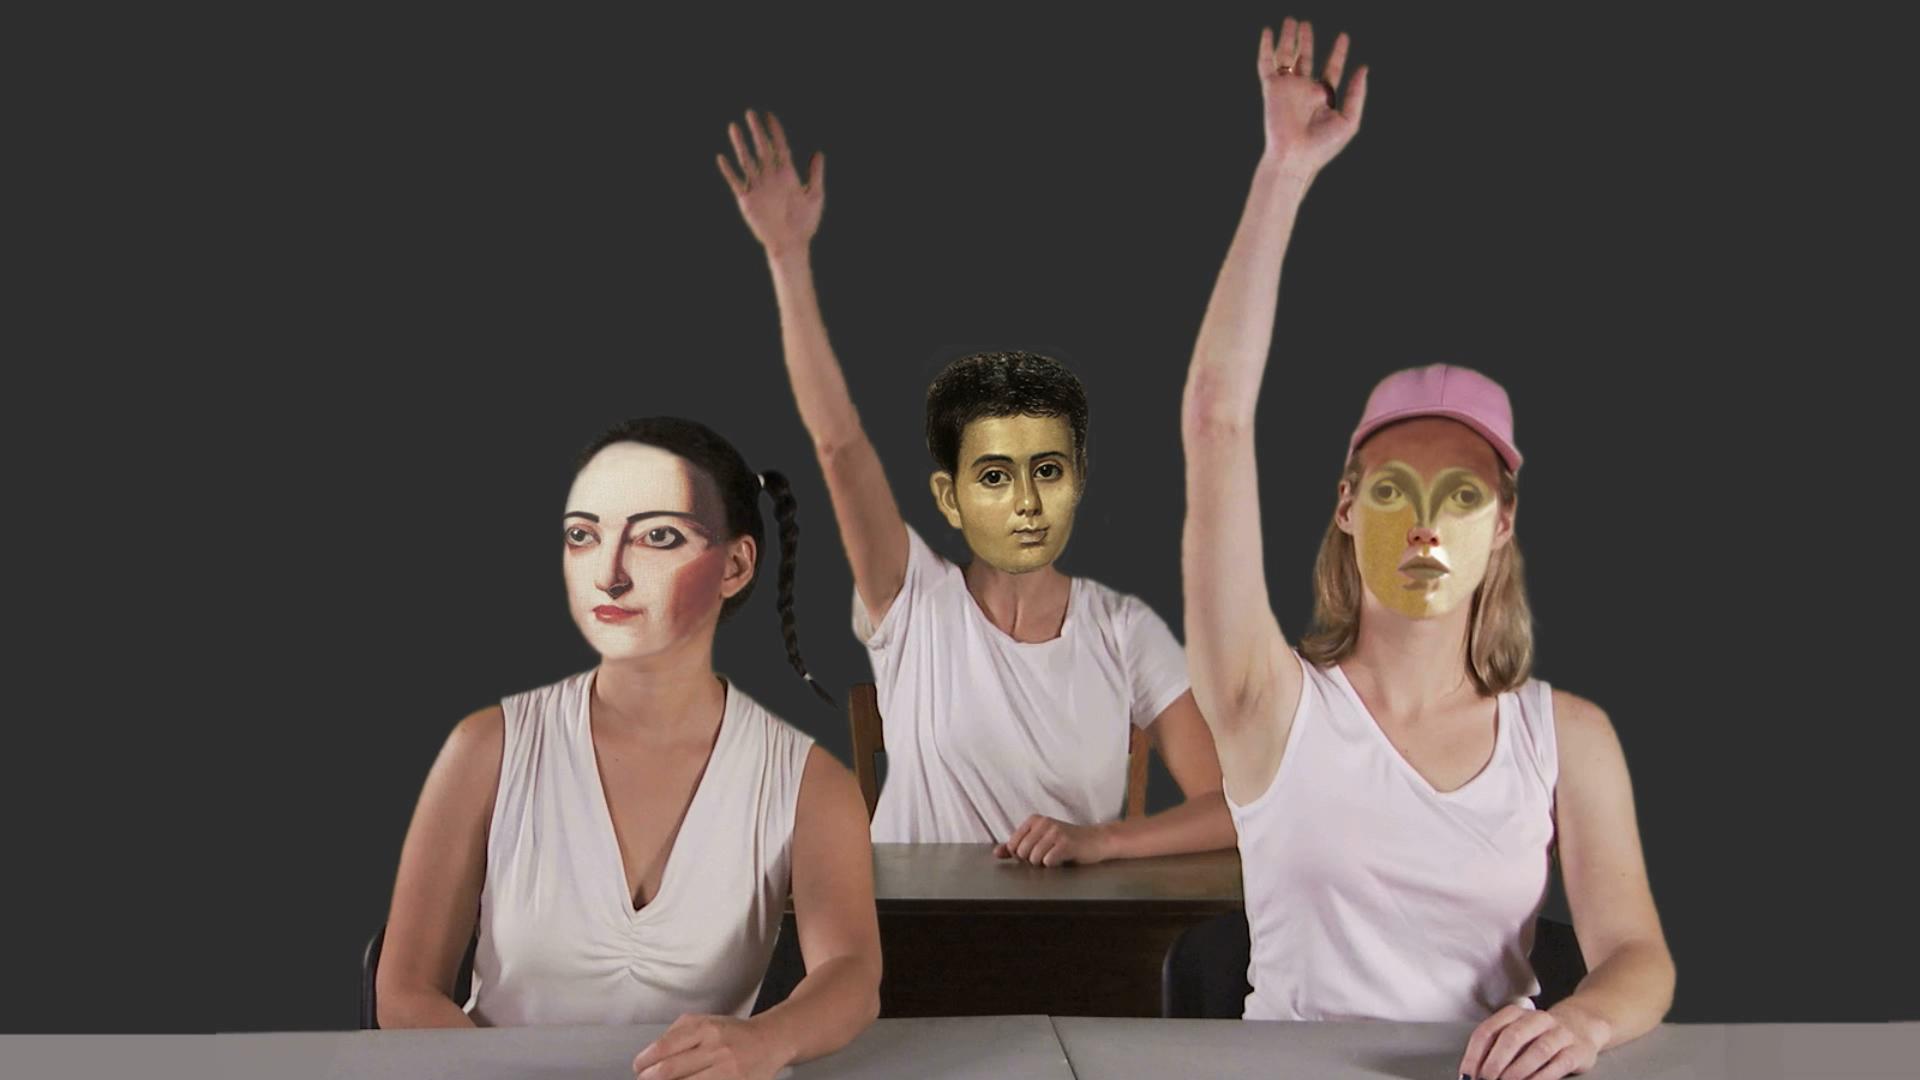 hands raised.jpg